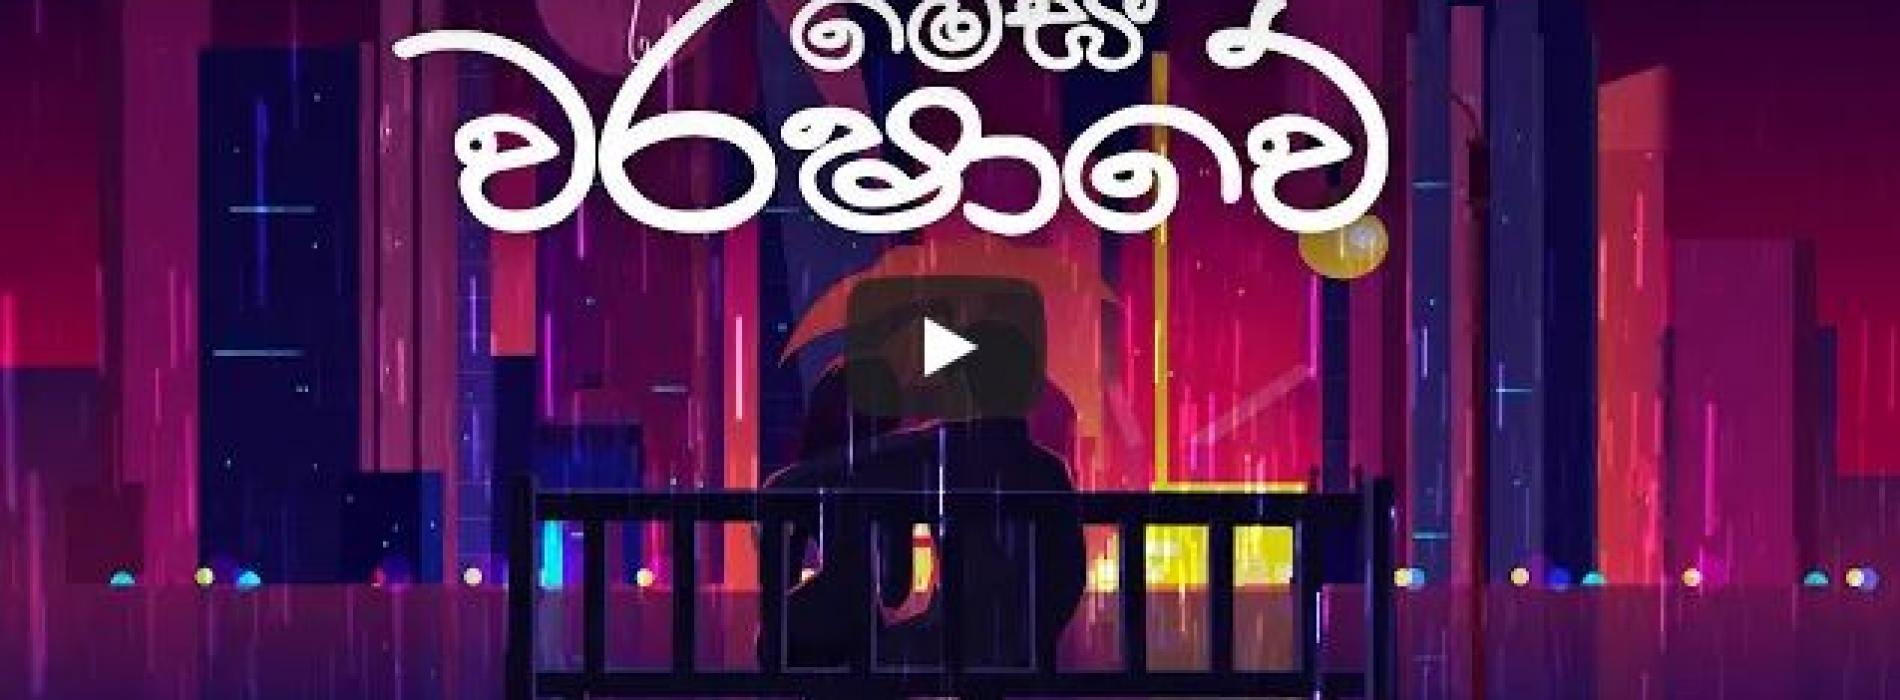 New Music : Megha Warshawe (මේඝ වර්ෂාවේ) – Mahiru Senarathne   Official Lyric Video